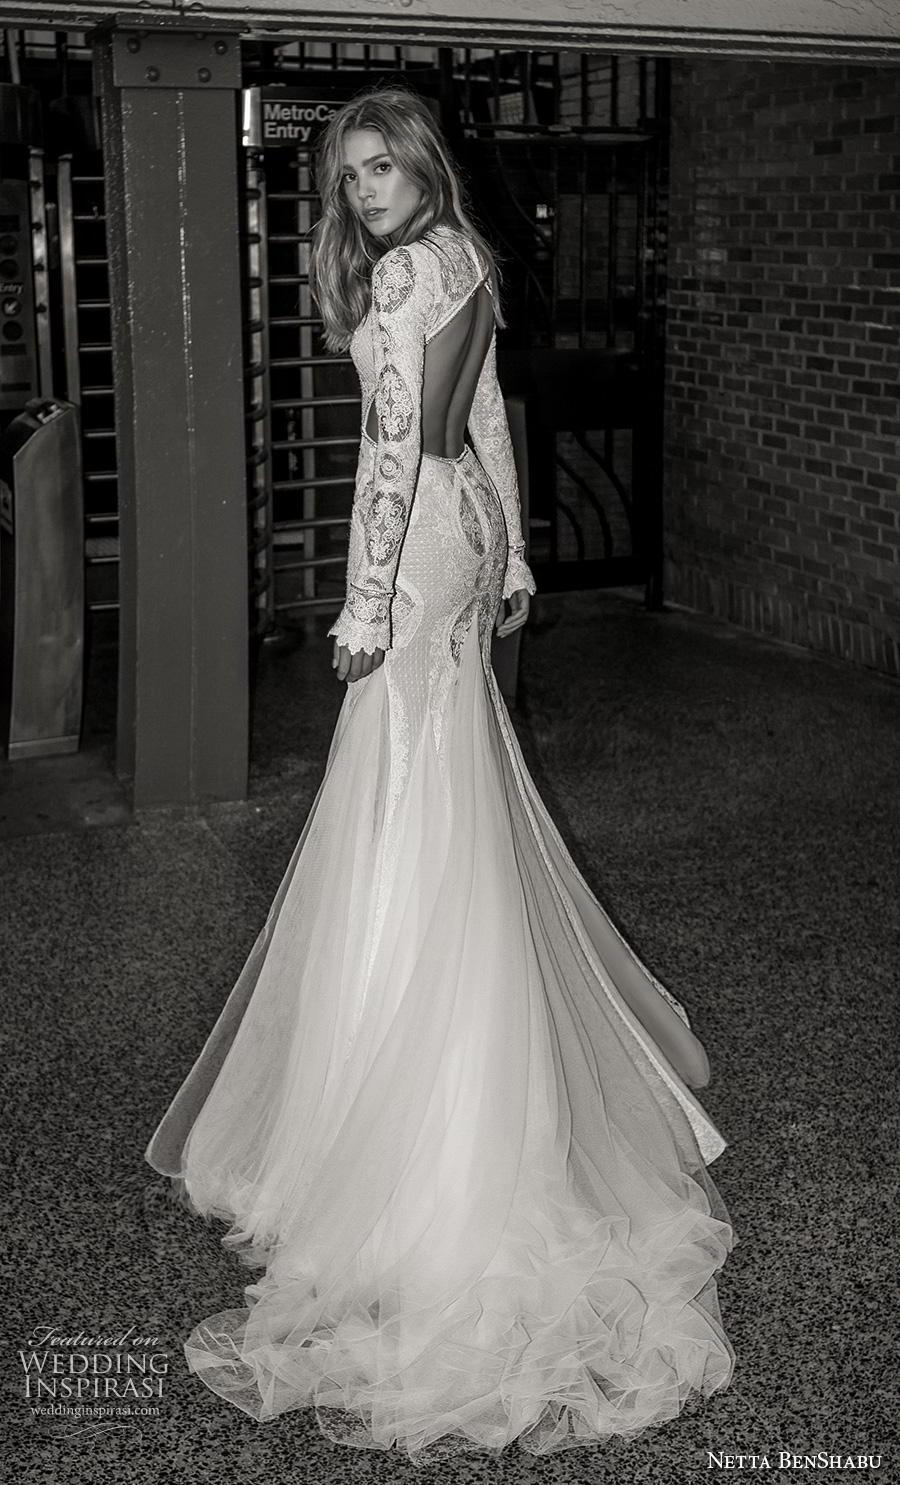 netta benshabu fall 2019 bridal long sleeves high neck keyhole bodice full embellishment slit skirt glamorous mermaid wedding dress keyhole back medium train (19) bv